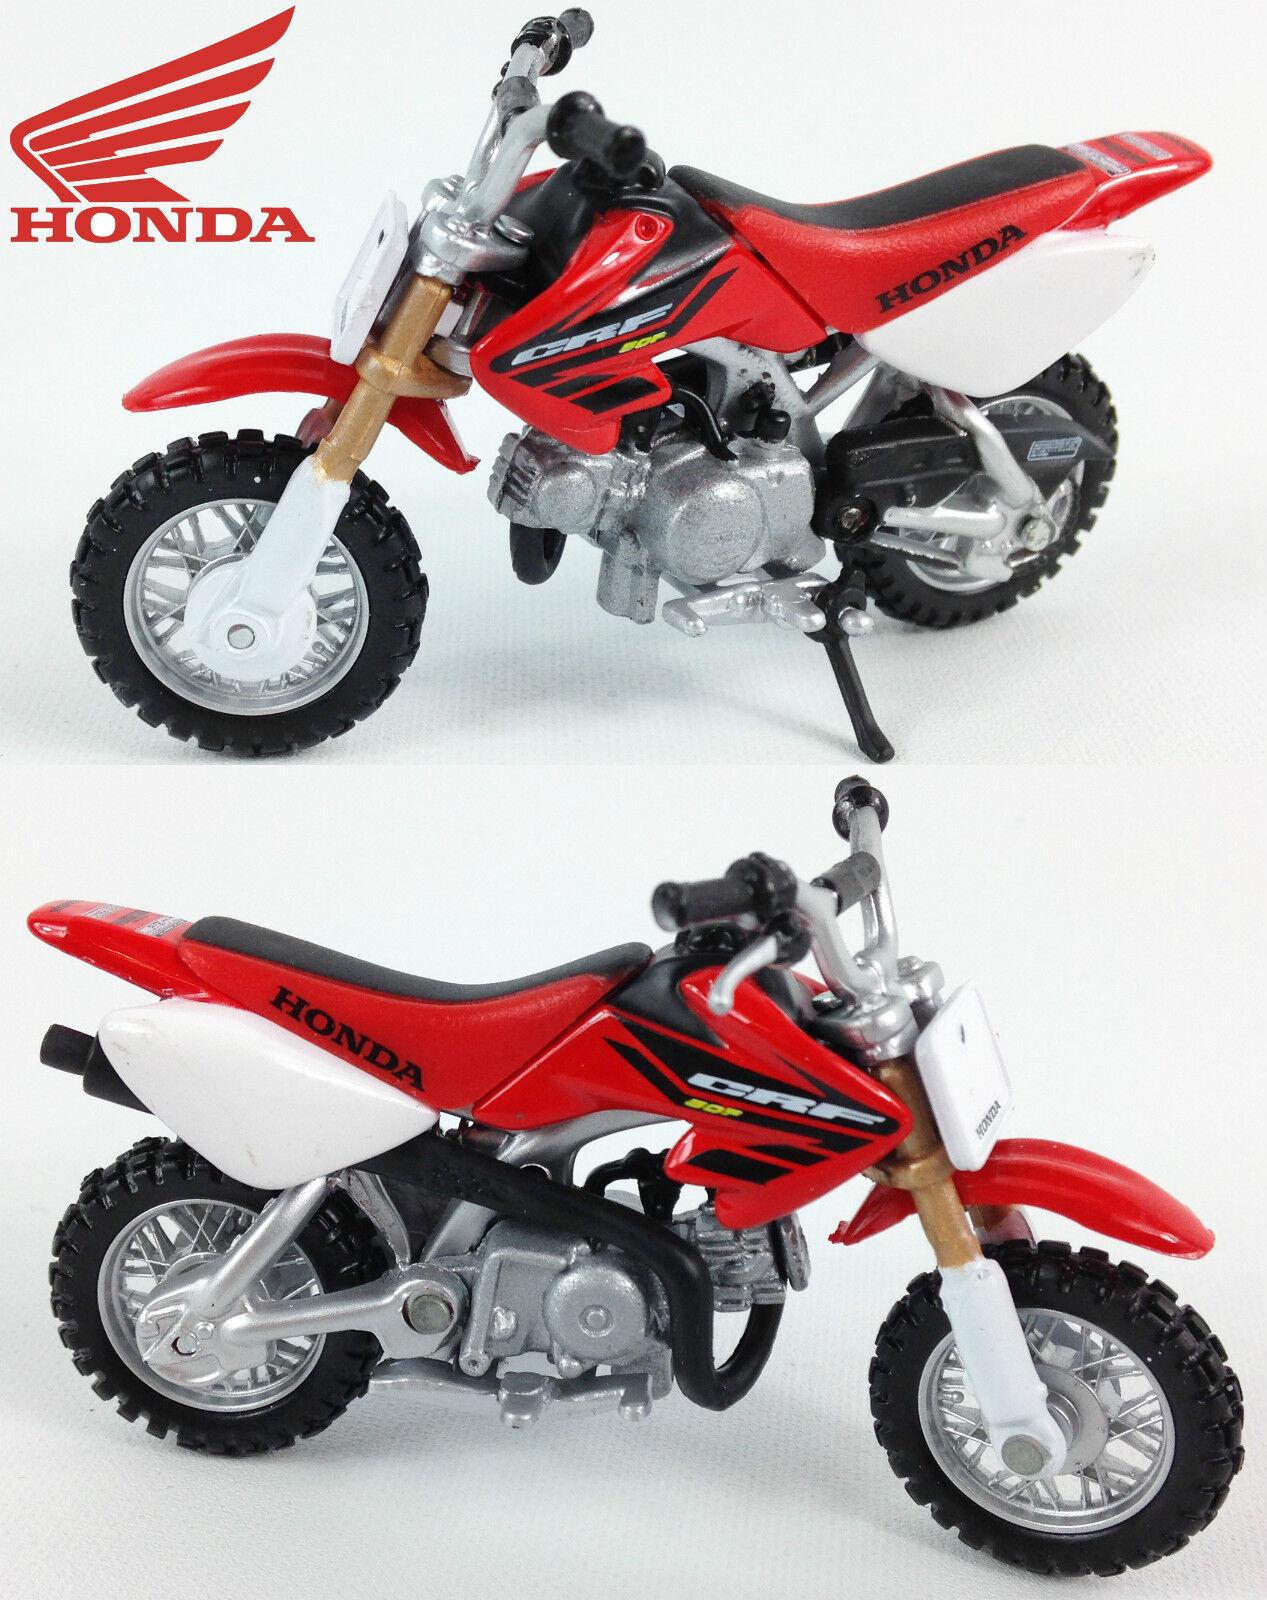 Honda Crf50 1 18 Die-Cast Motocross Mx Juguete Modelo Motocicleta rosso Mini